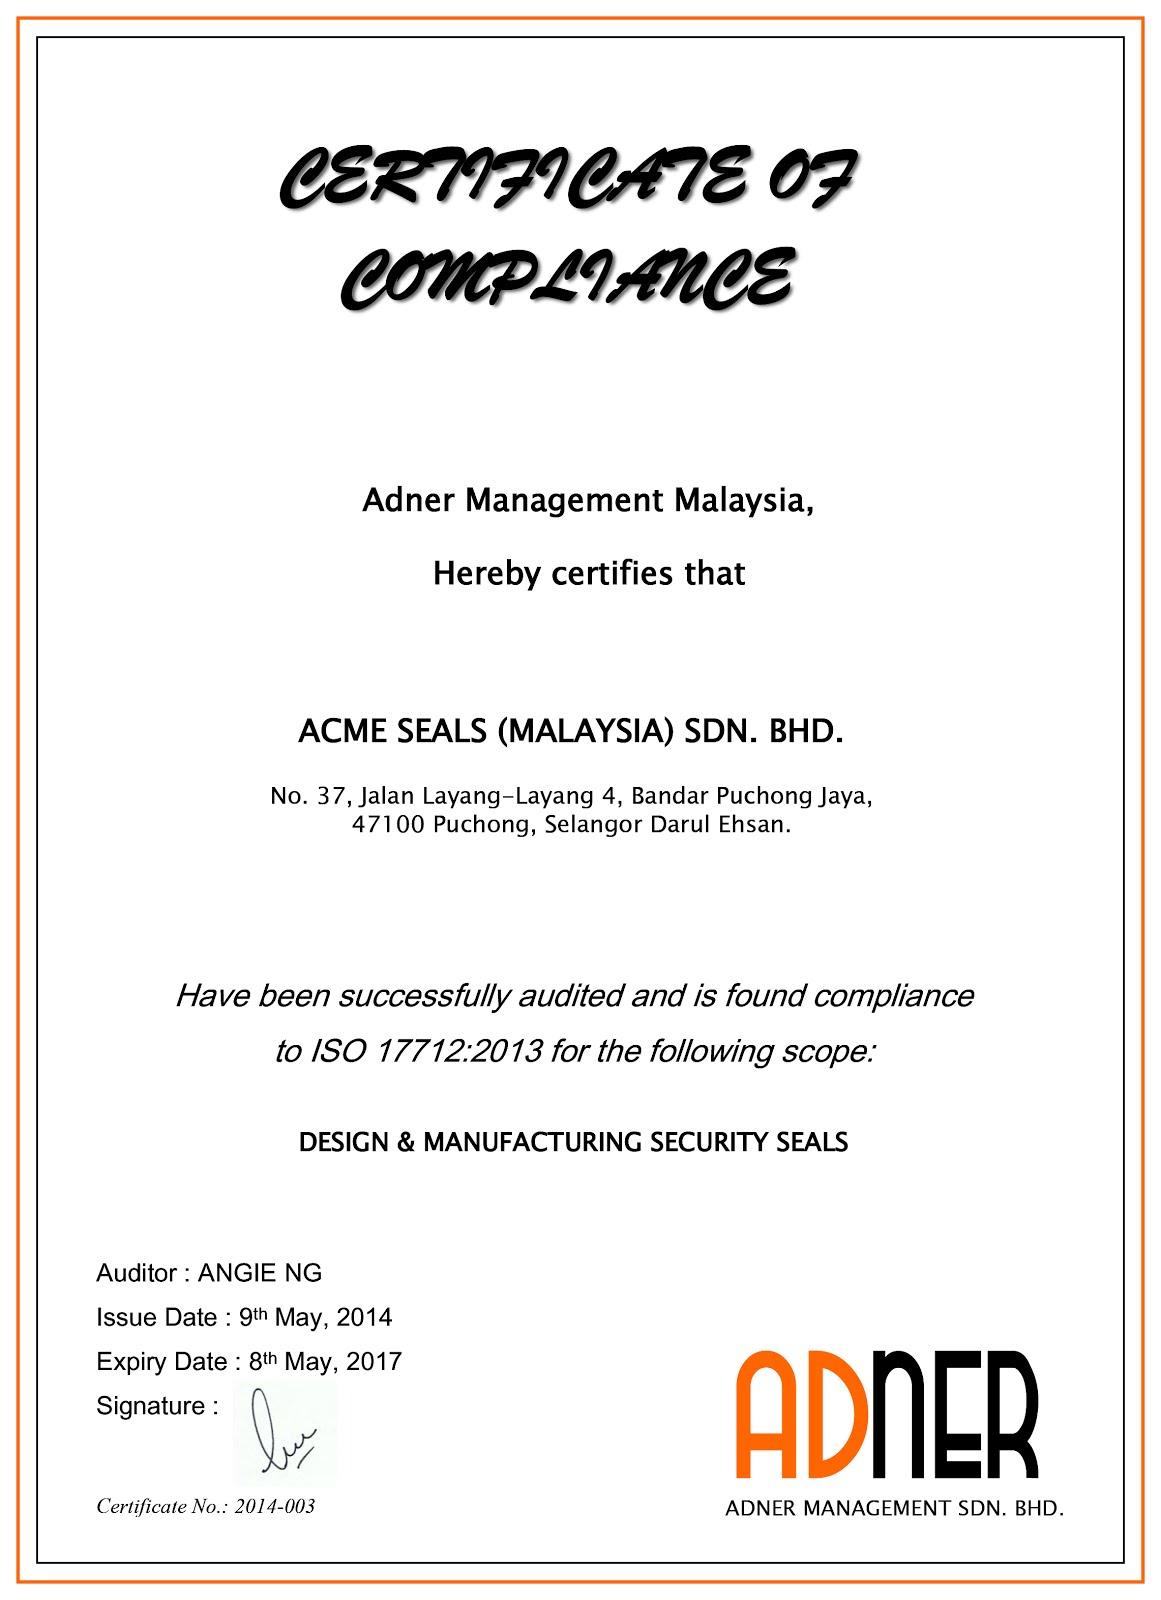 Seal niêm phong ISO 17712:2013